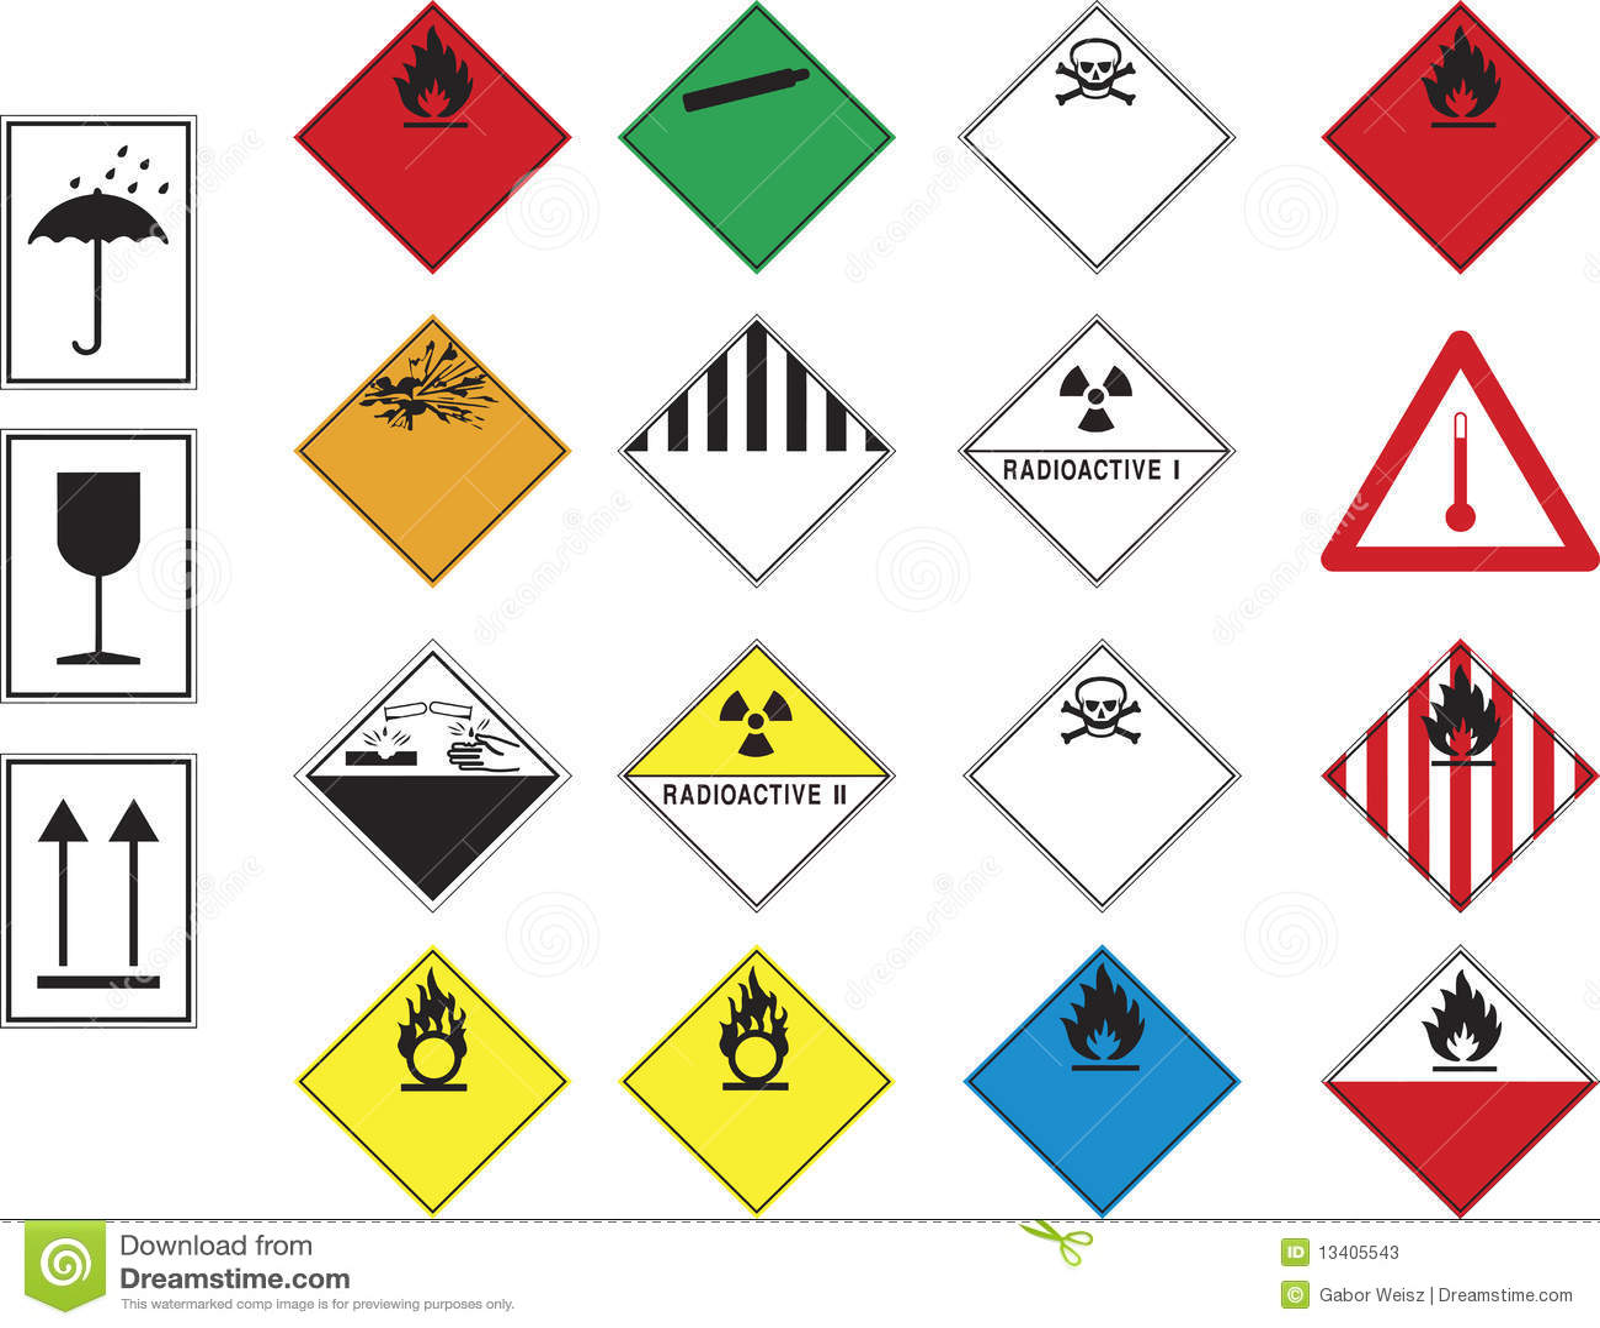 Hazard symbols stock vector illustration of chemistry 13405543 hazard symbols biocorpaavc Gallery